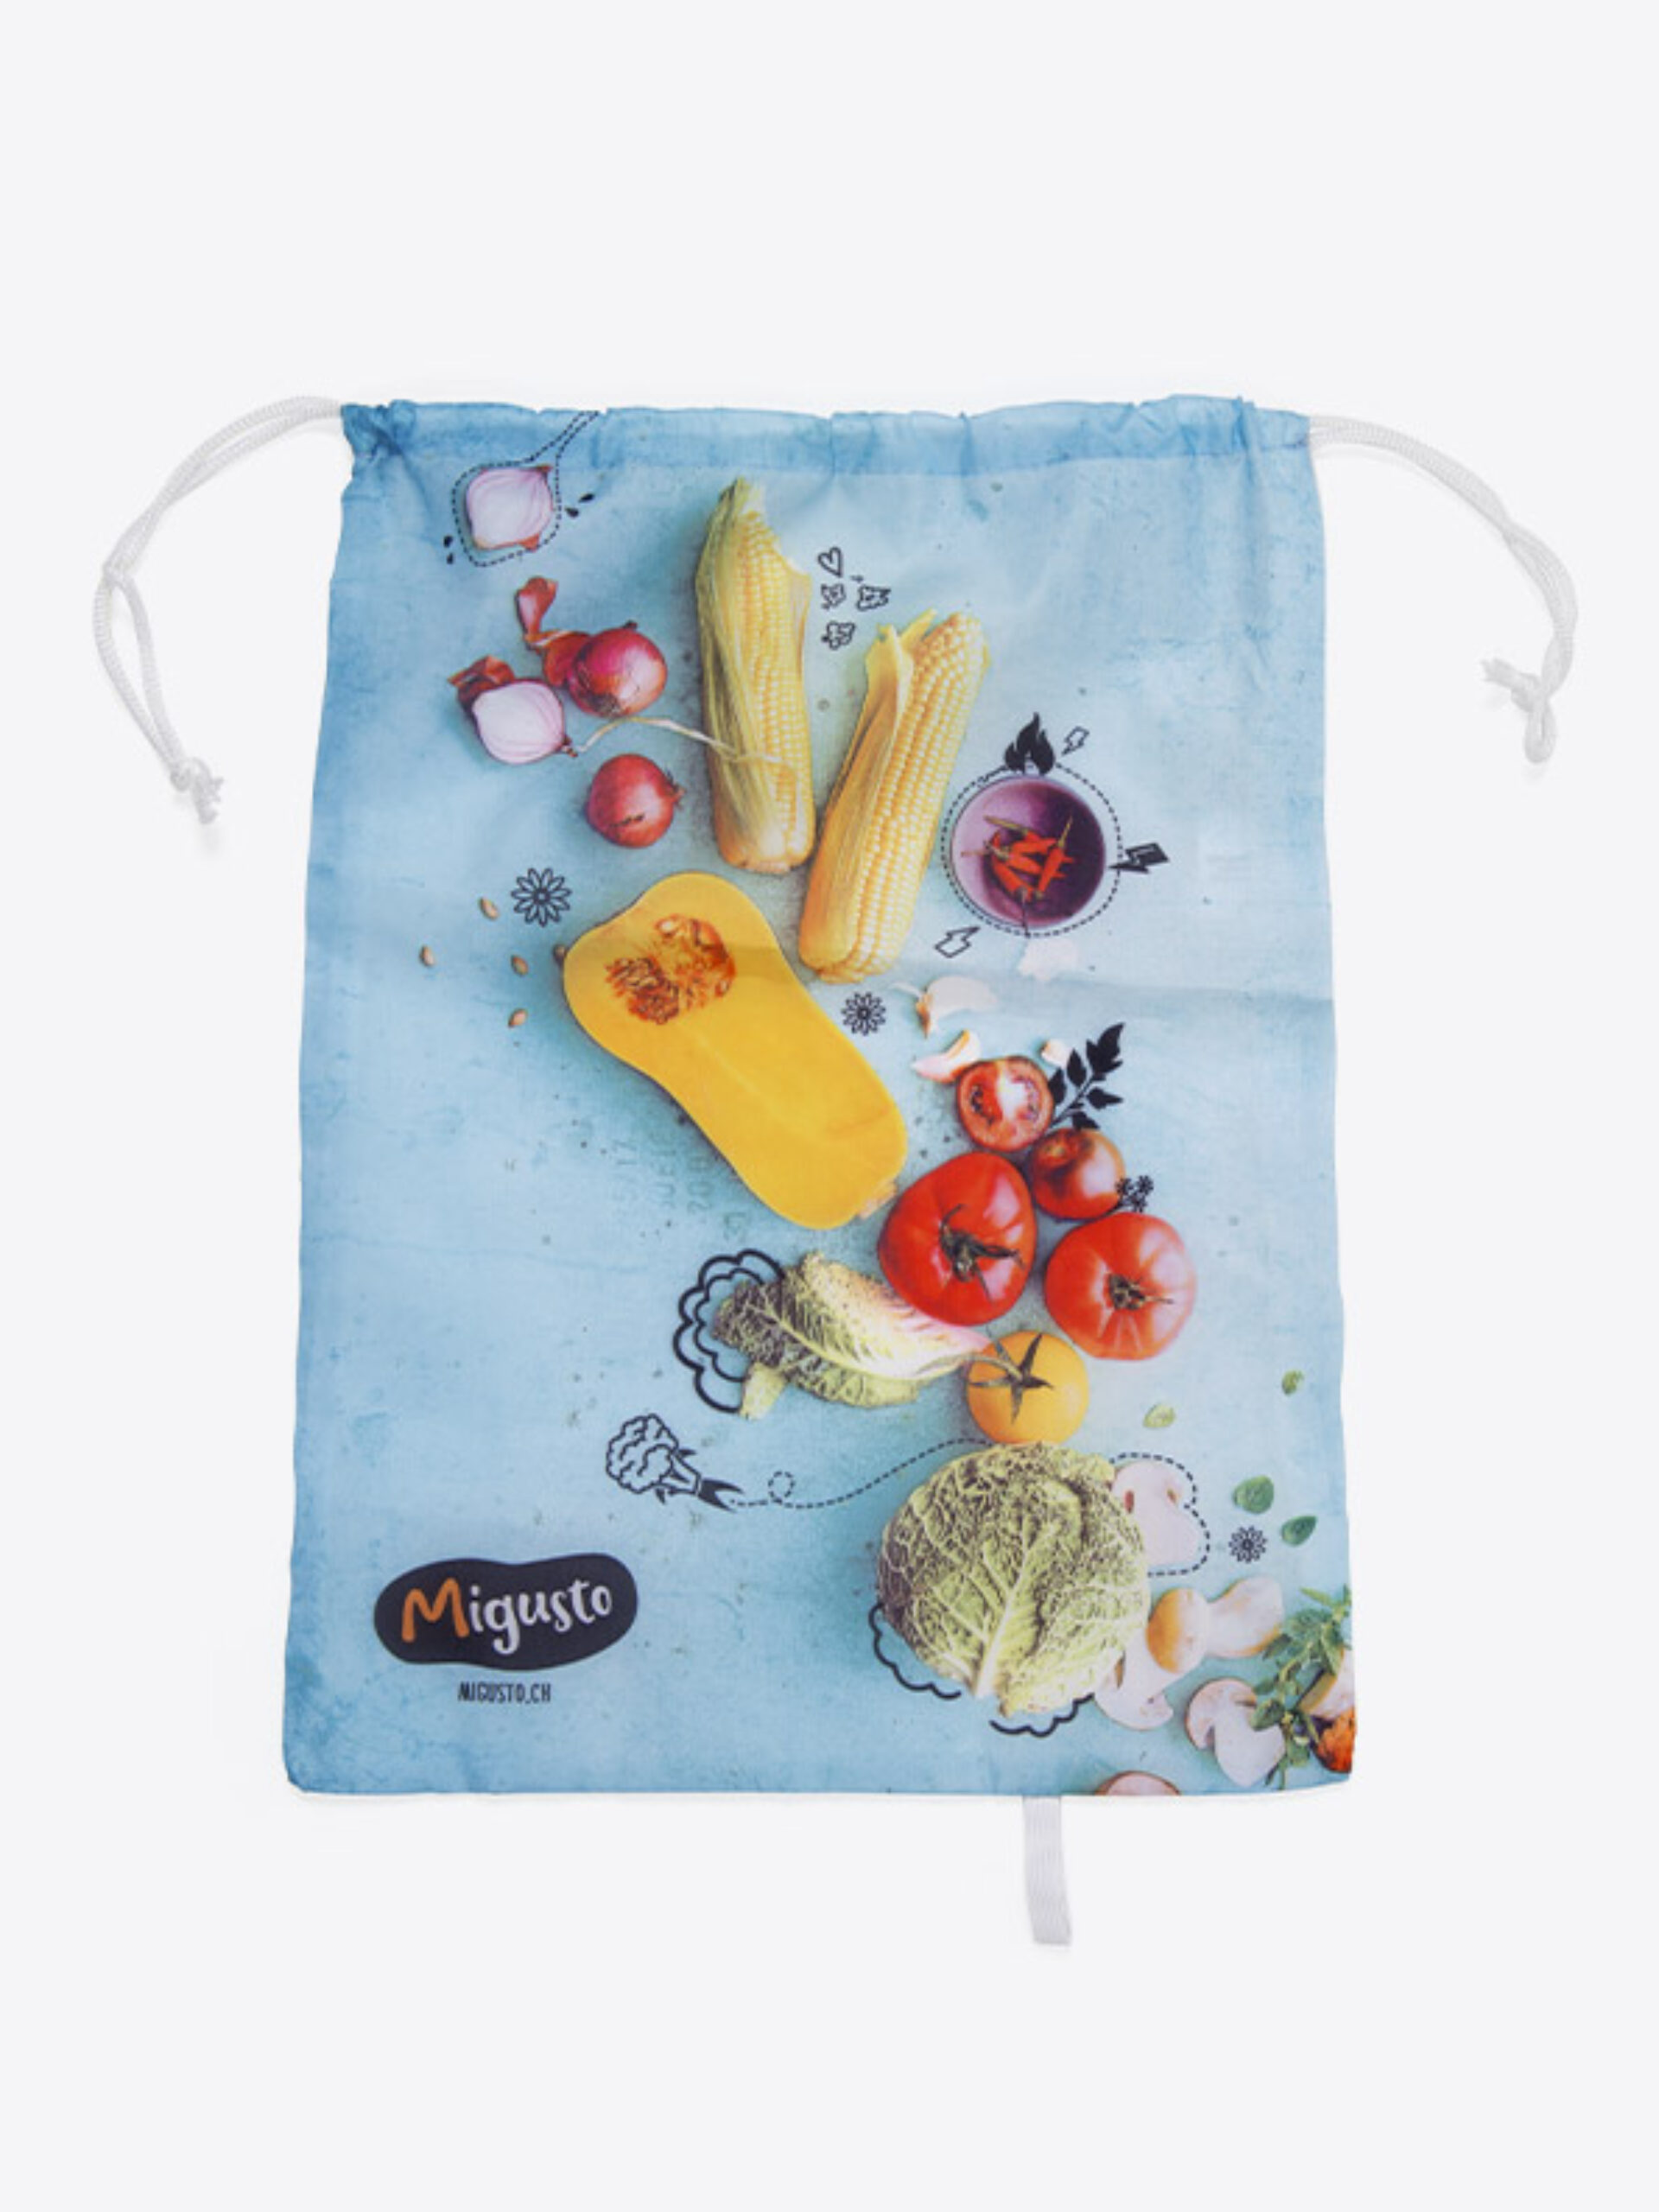 Veggie Bag Gemuese Fruechte Sack Digitaldruck Migusto